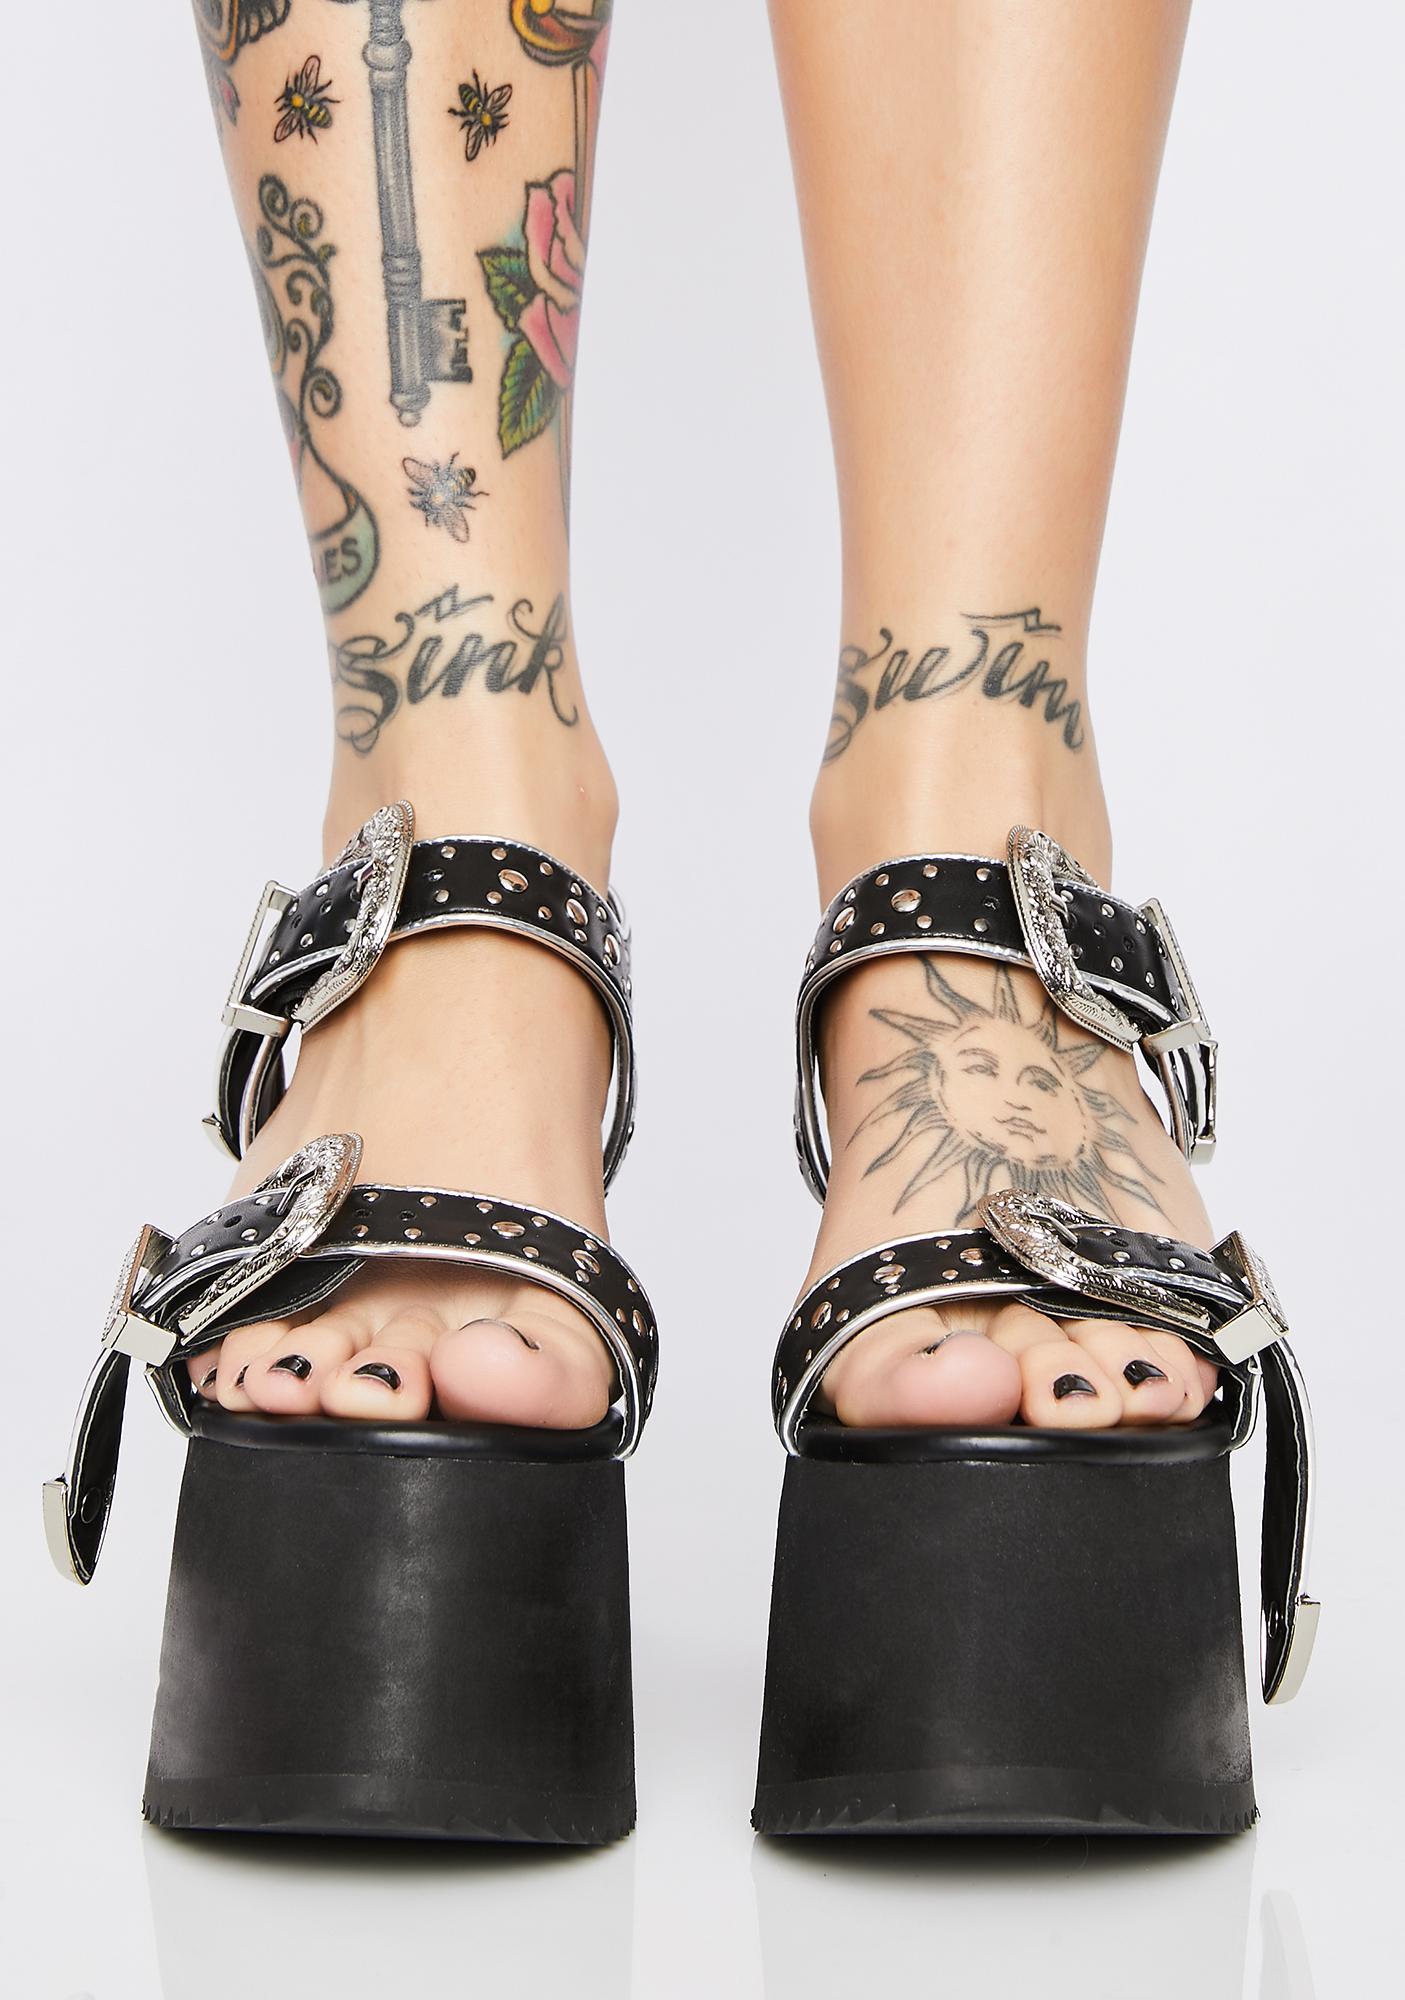 Club Exx Lawbreaker Platform Sandals